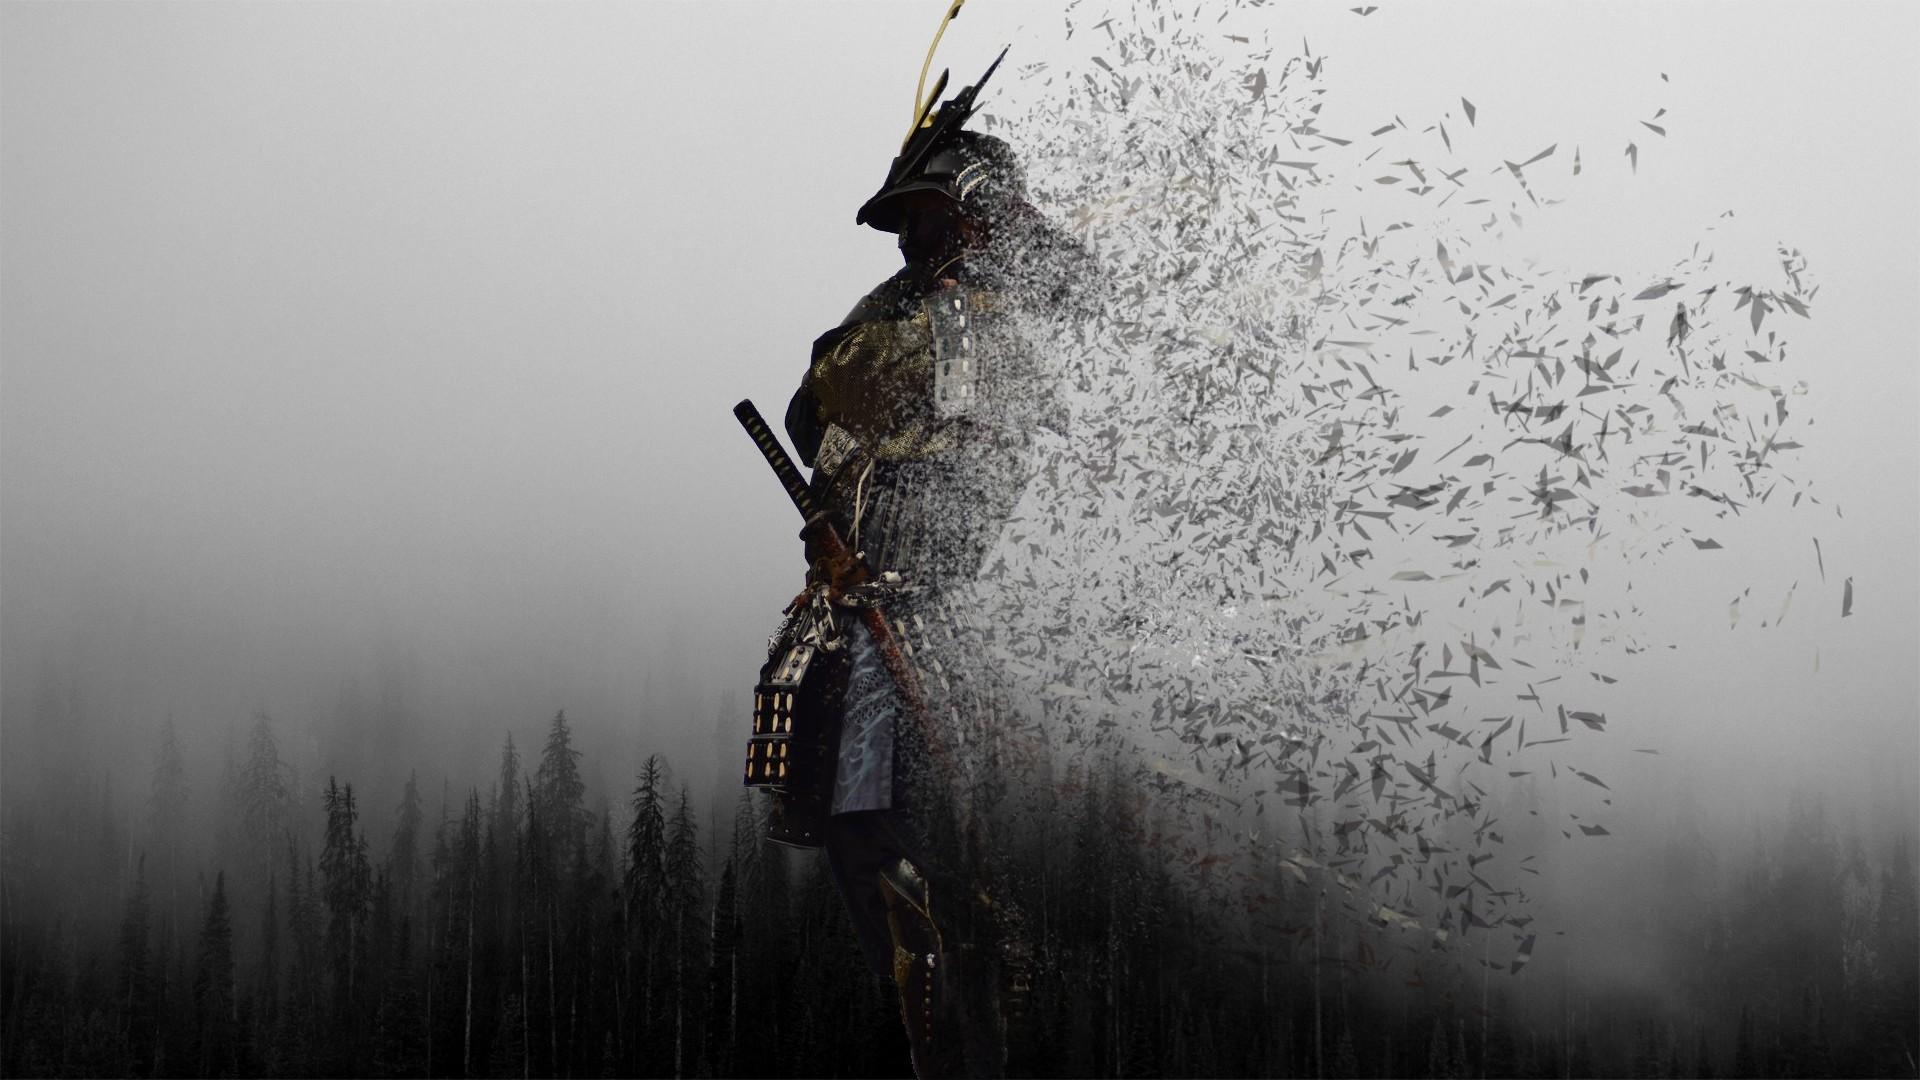 Samurai HD Wallpaper